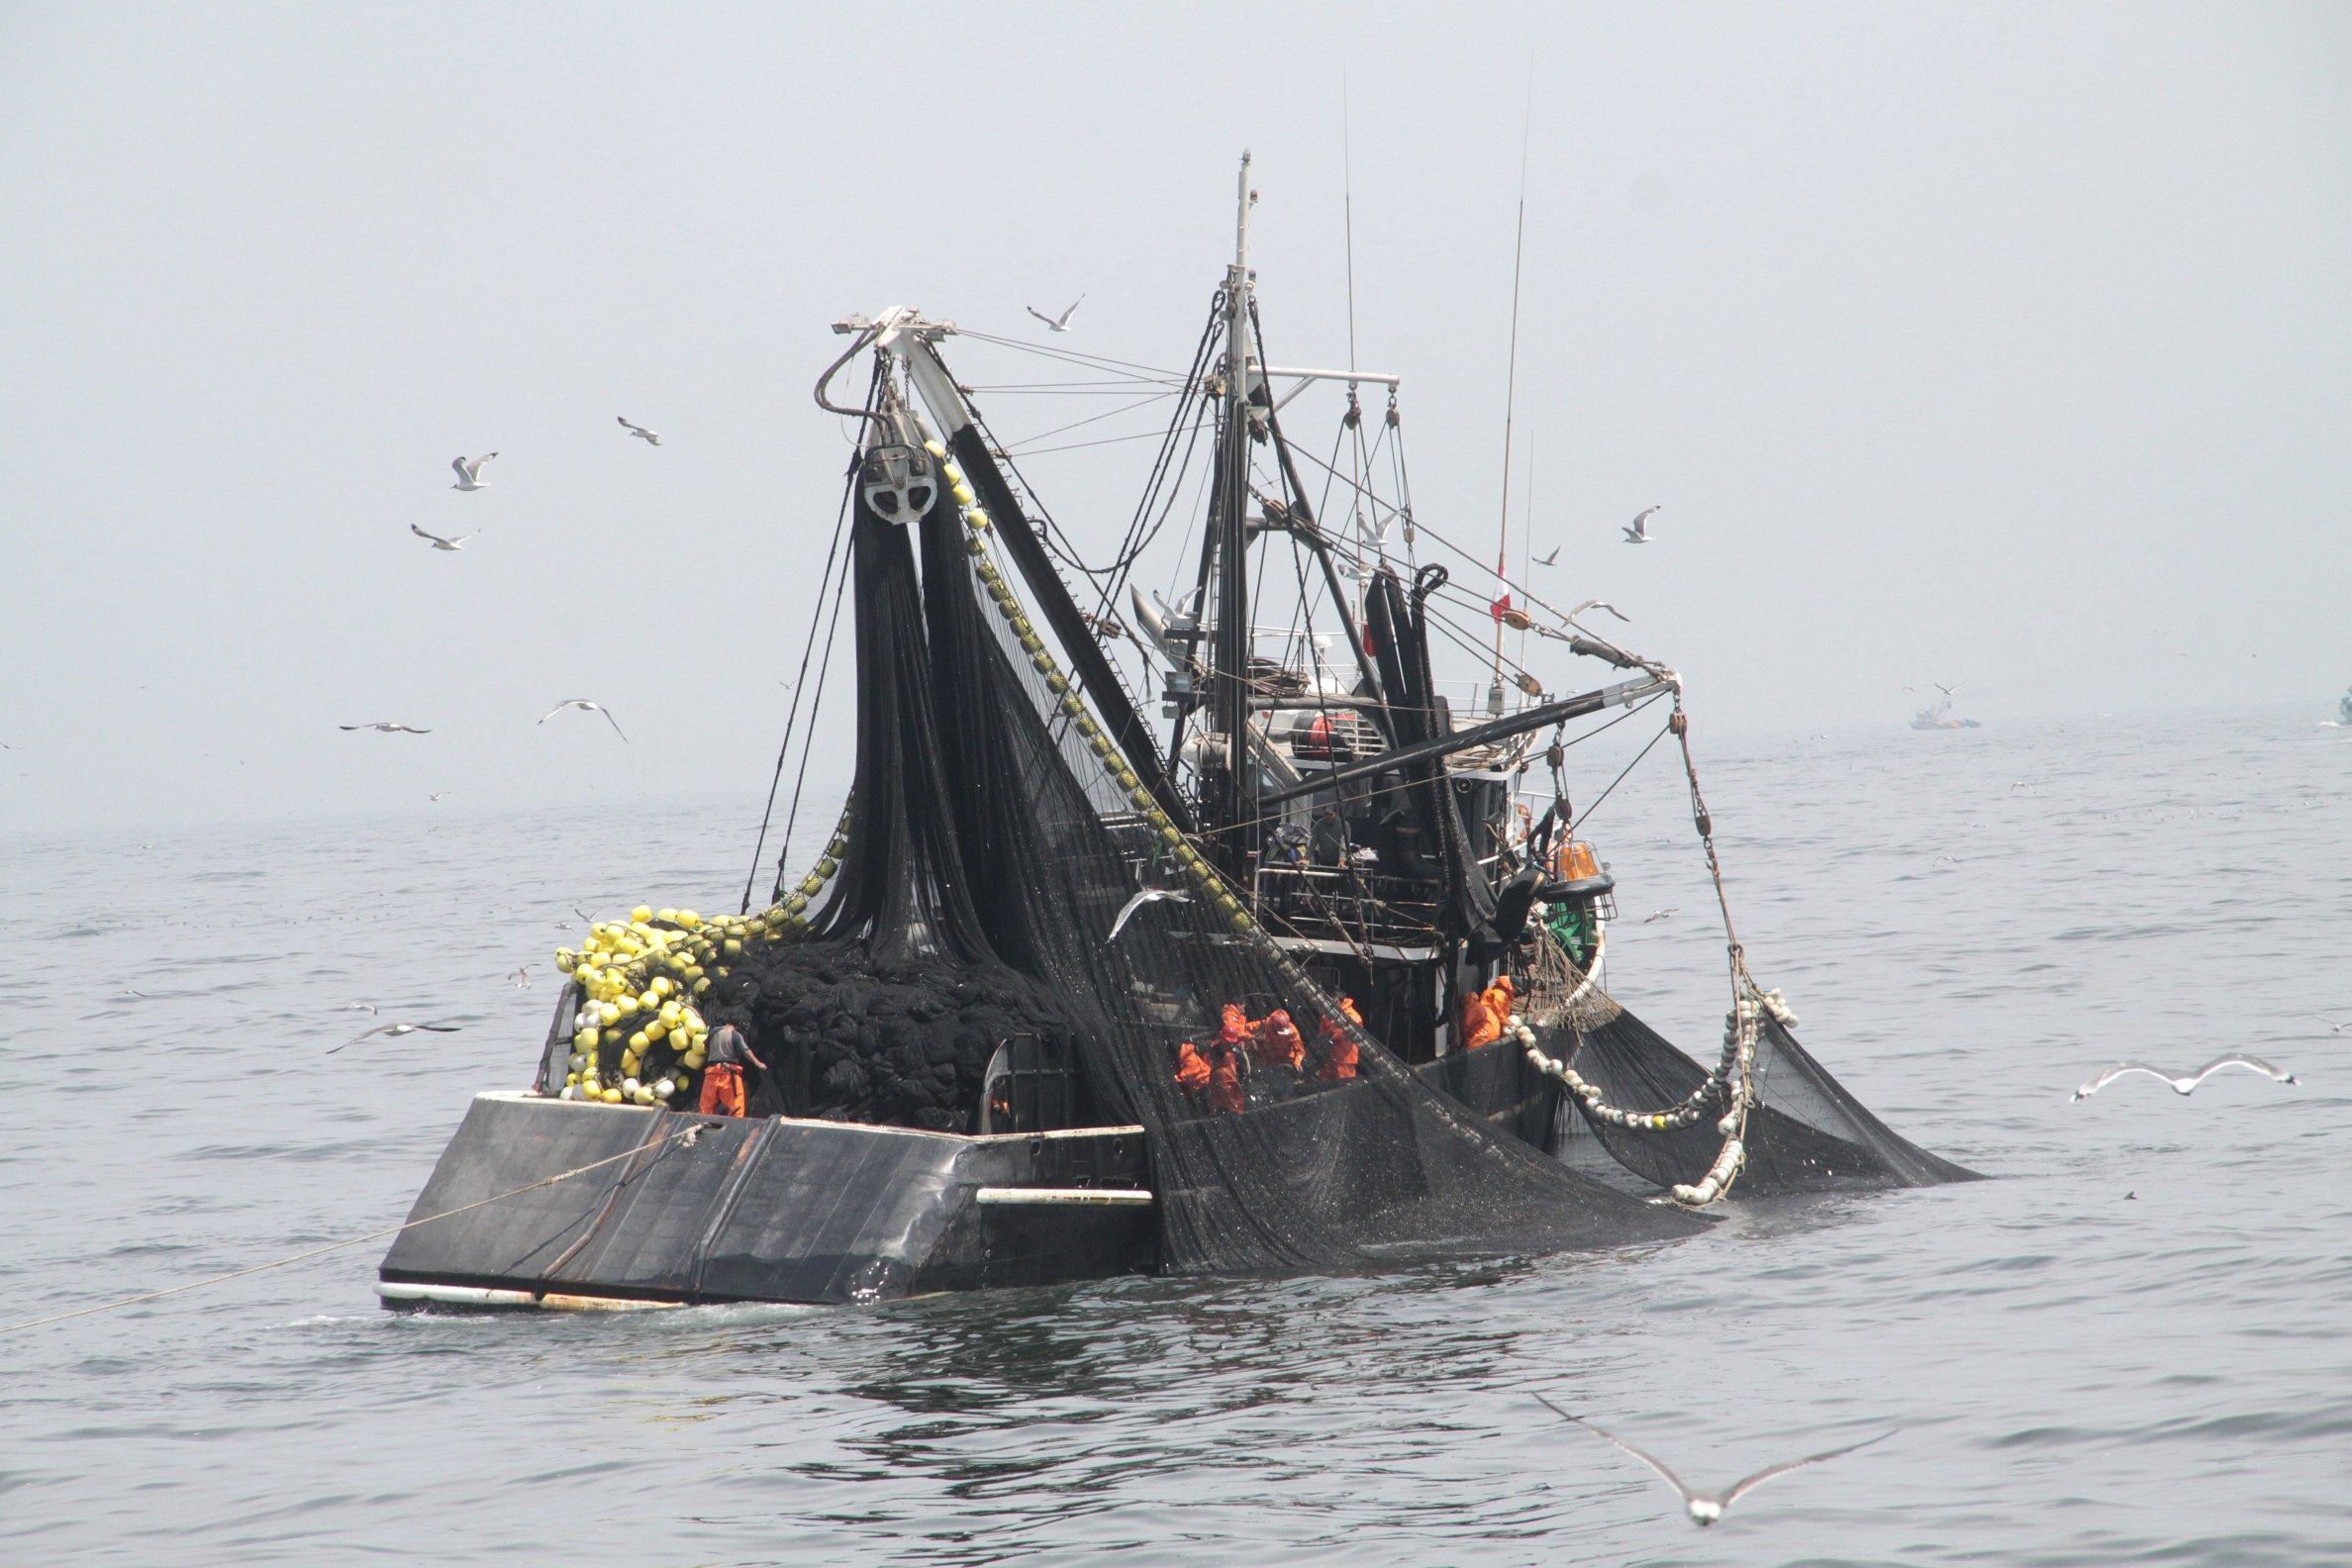 Sociedad nacional de pesquer a asegura que pesca de for Ministerio de pesqueria